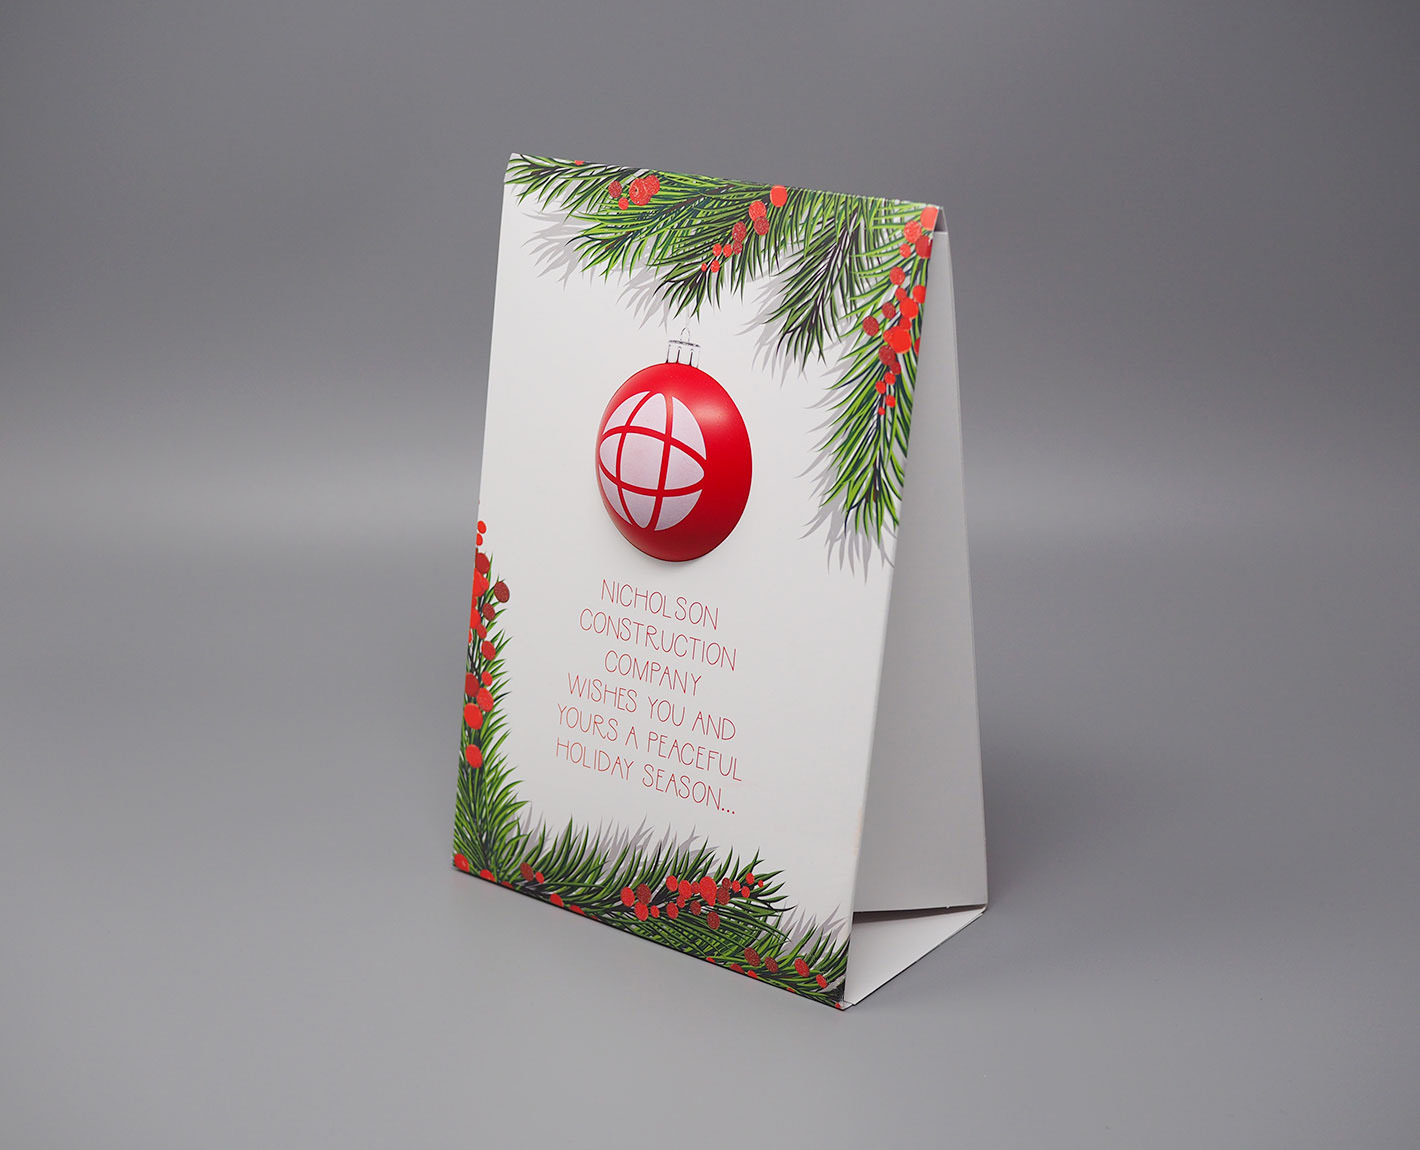 Nicholson holiday card by Tara Hoover